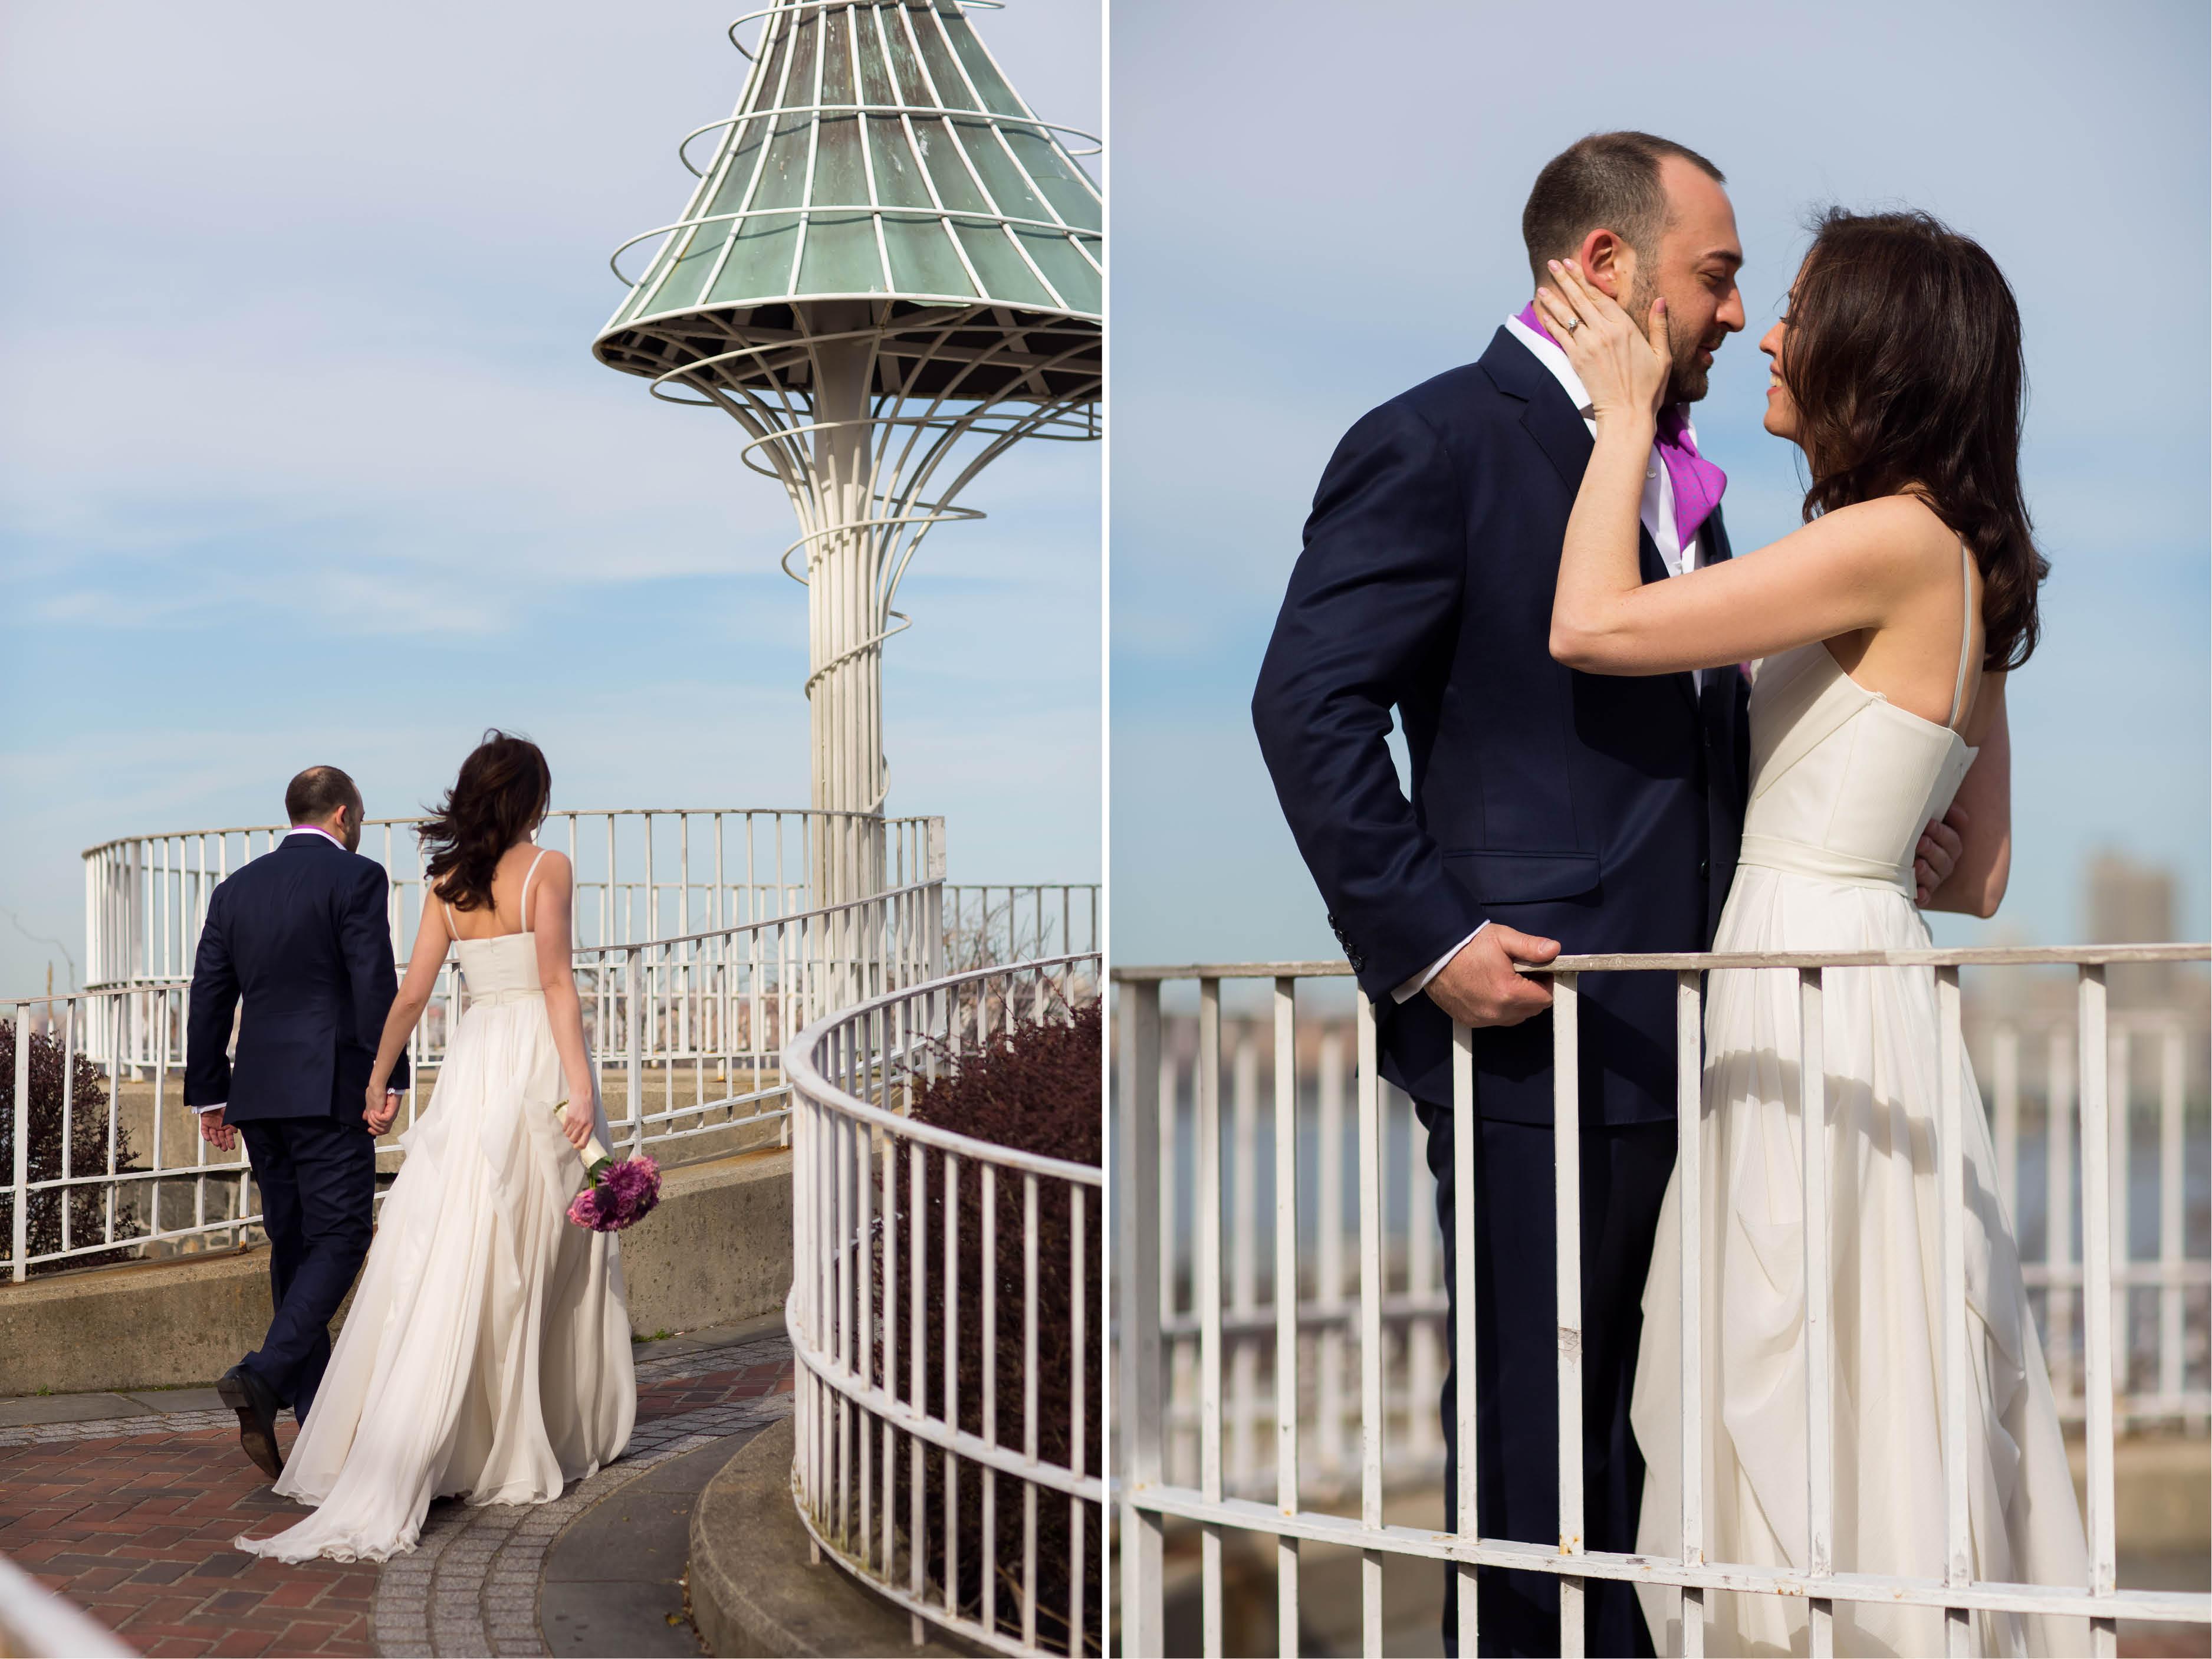 Emma_cleary_ photography_Waterside NJ wedding6